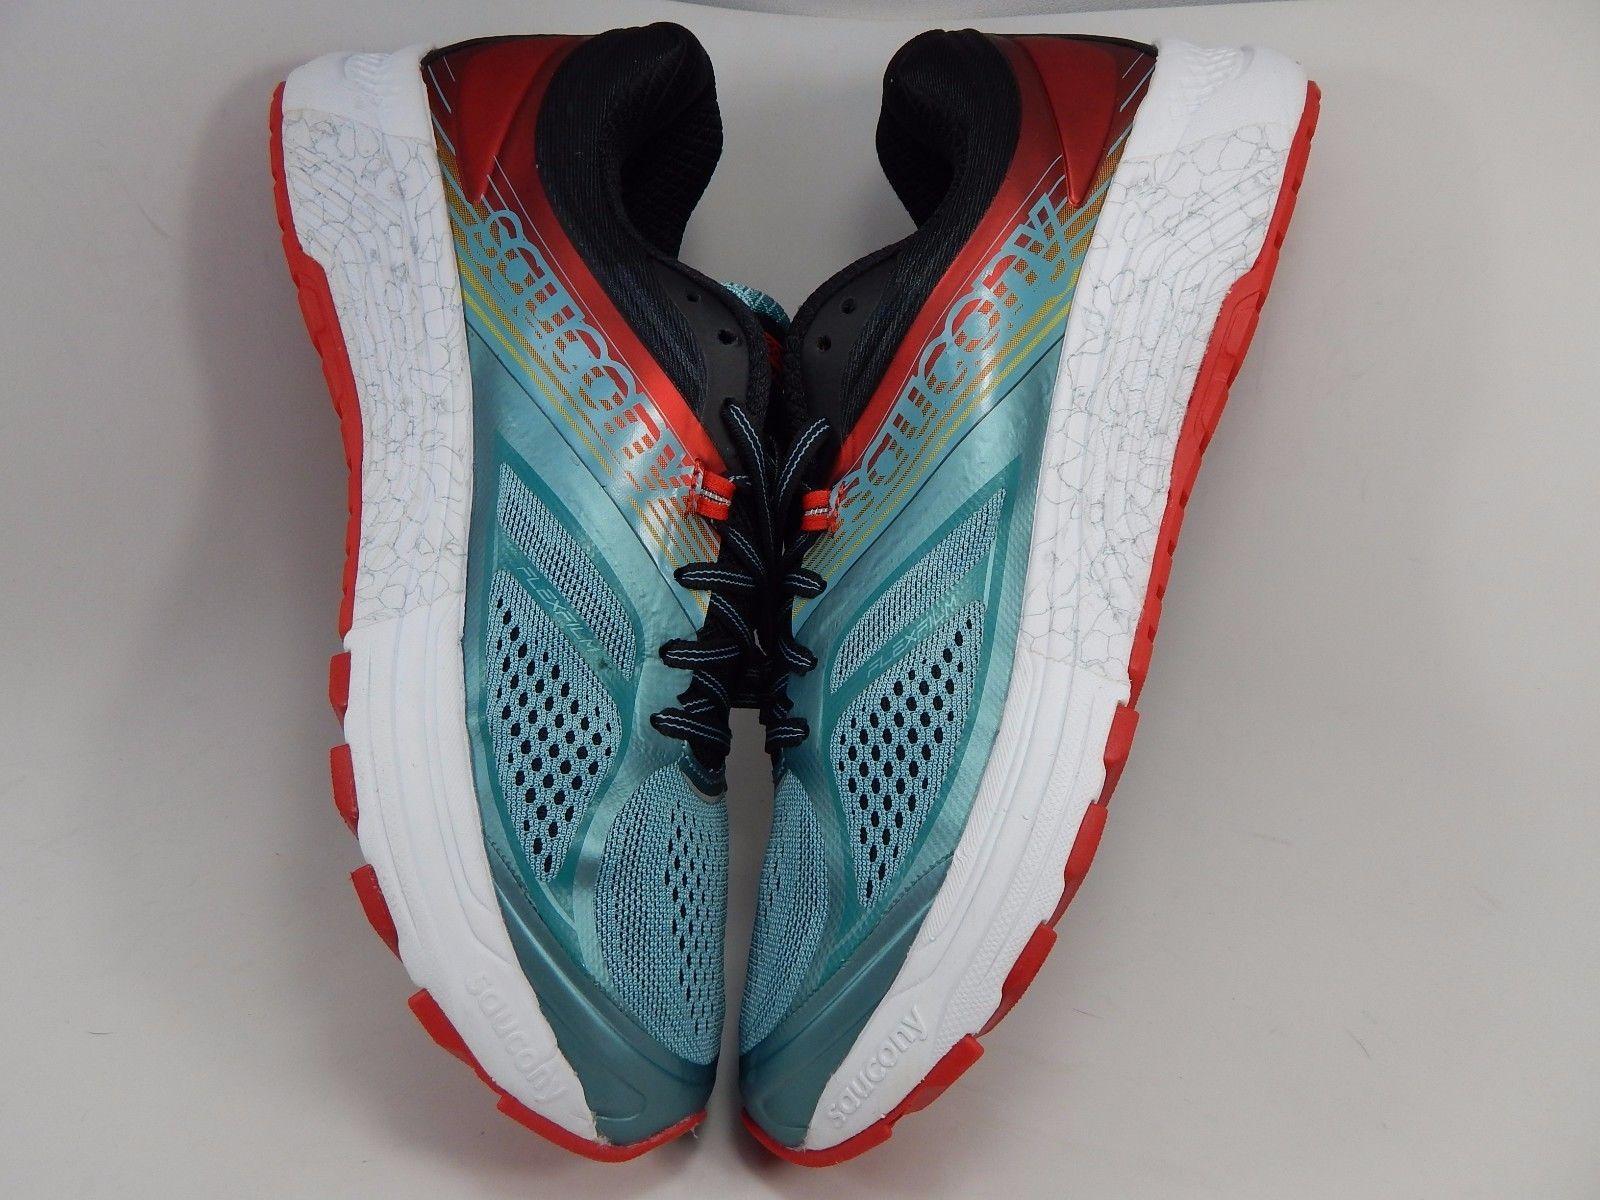 Saucony Guide 10 Men's Running Shoes Size US 10 M (D) EU 44 Green S20350-2